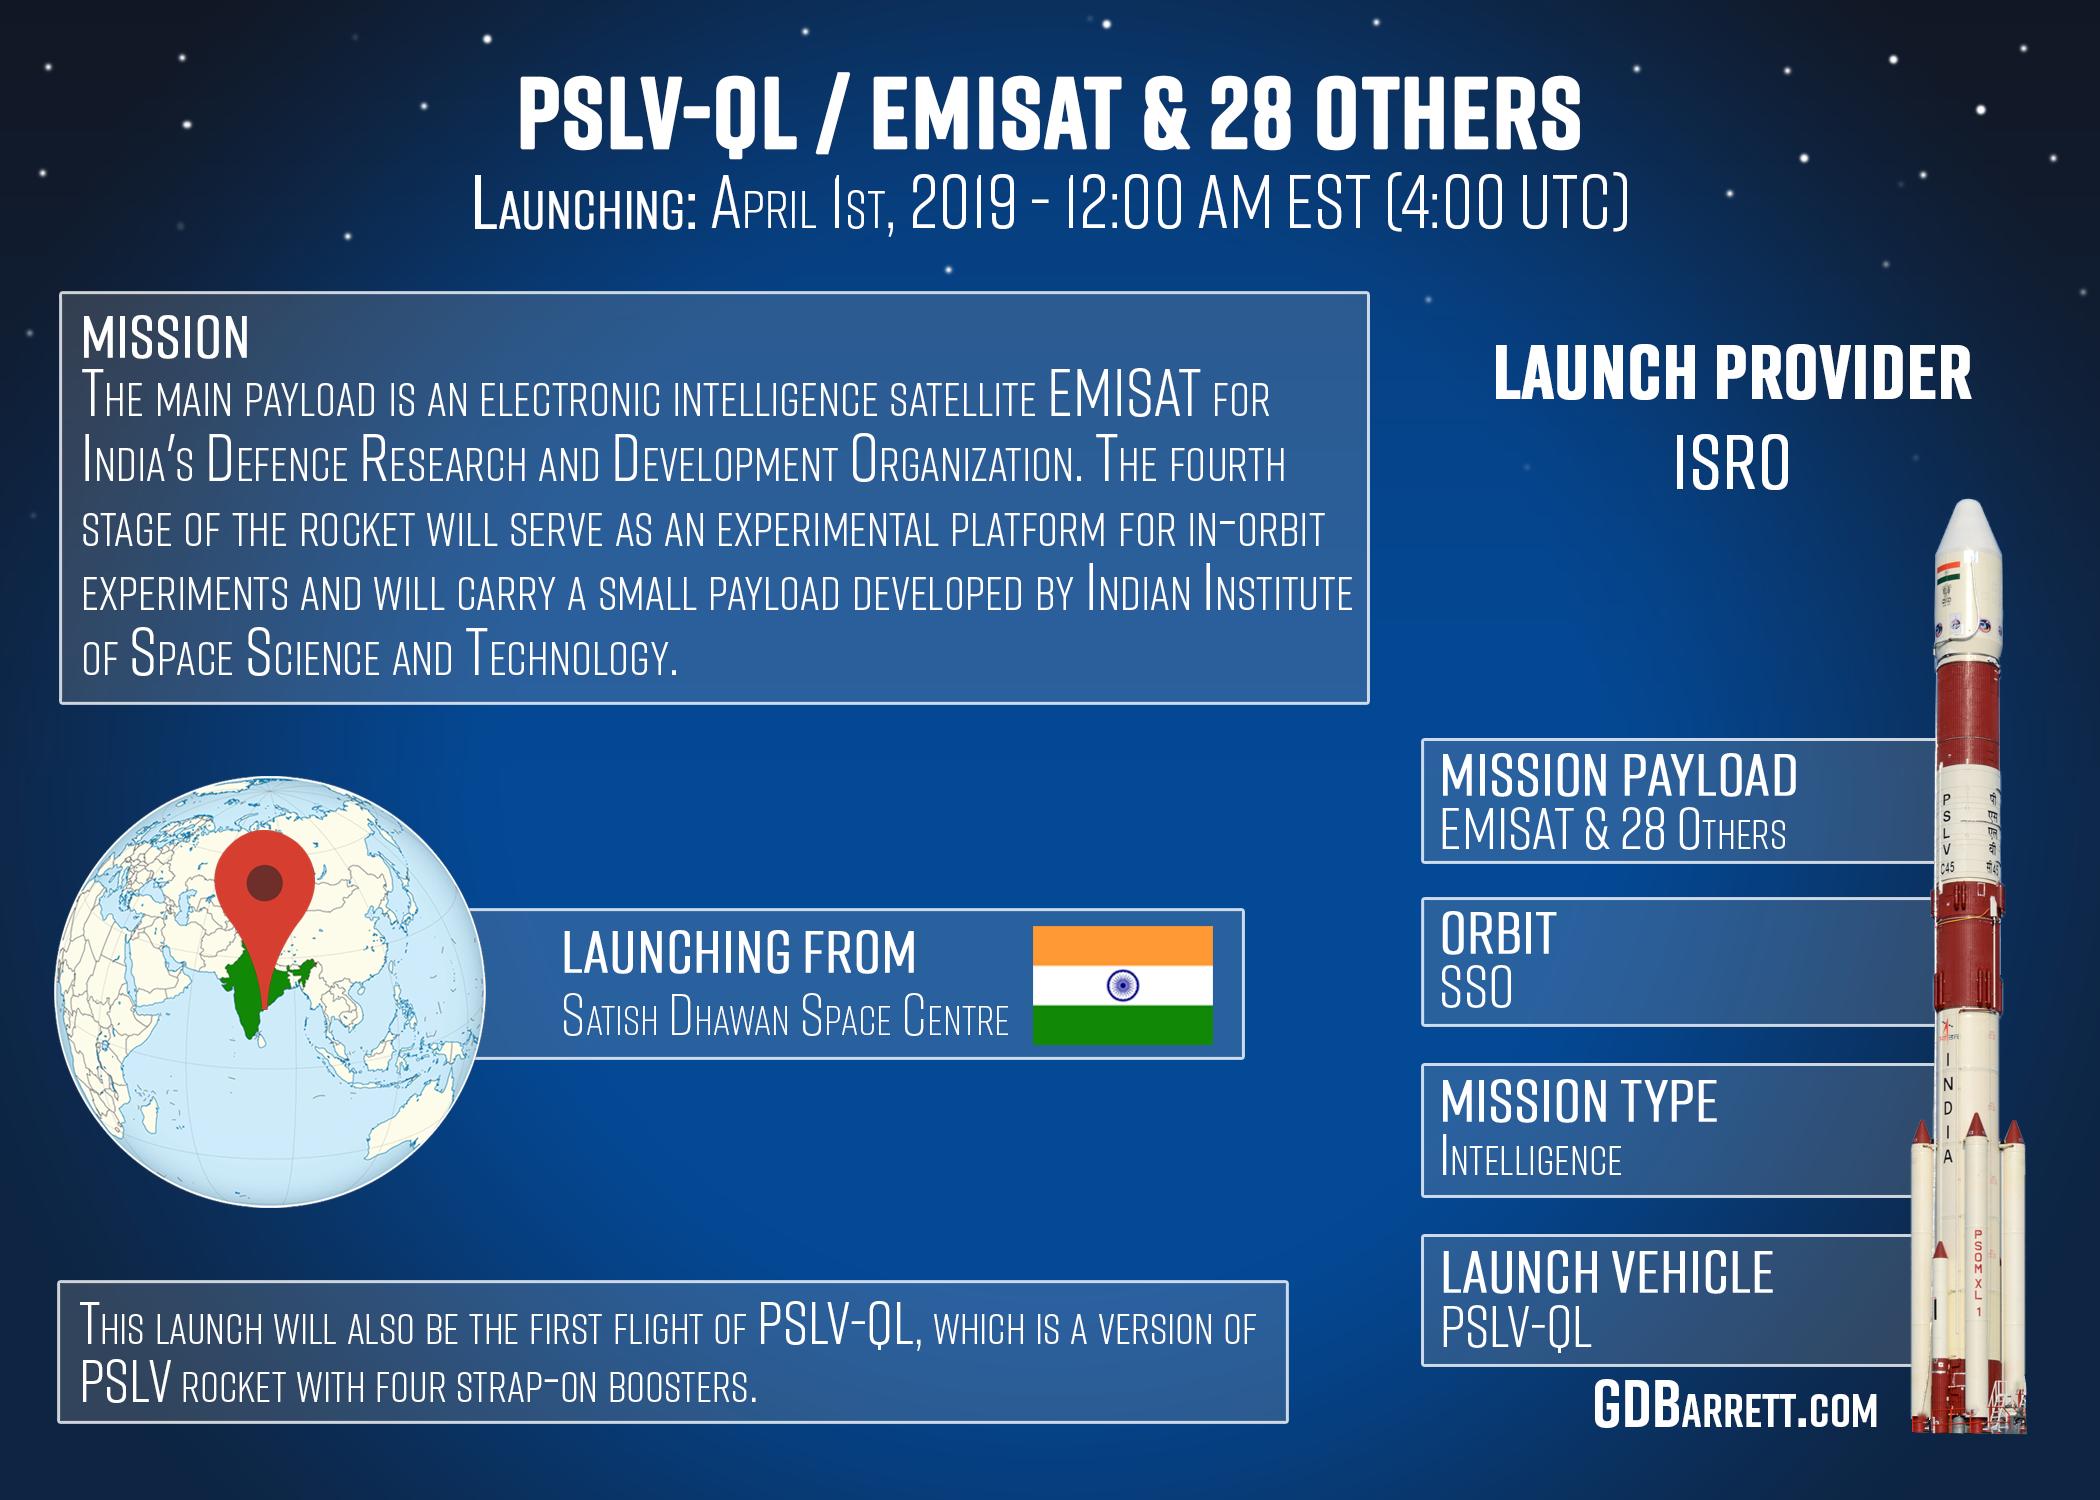 ISRO PSLV / EMISAT